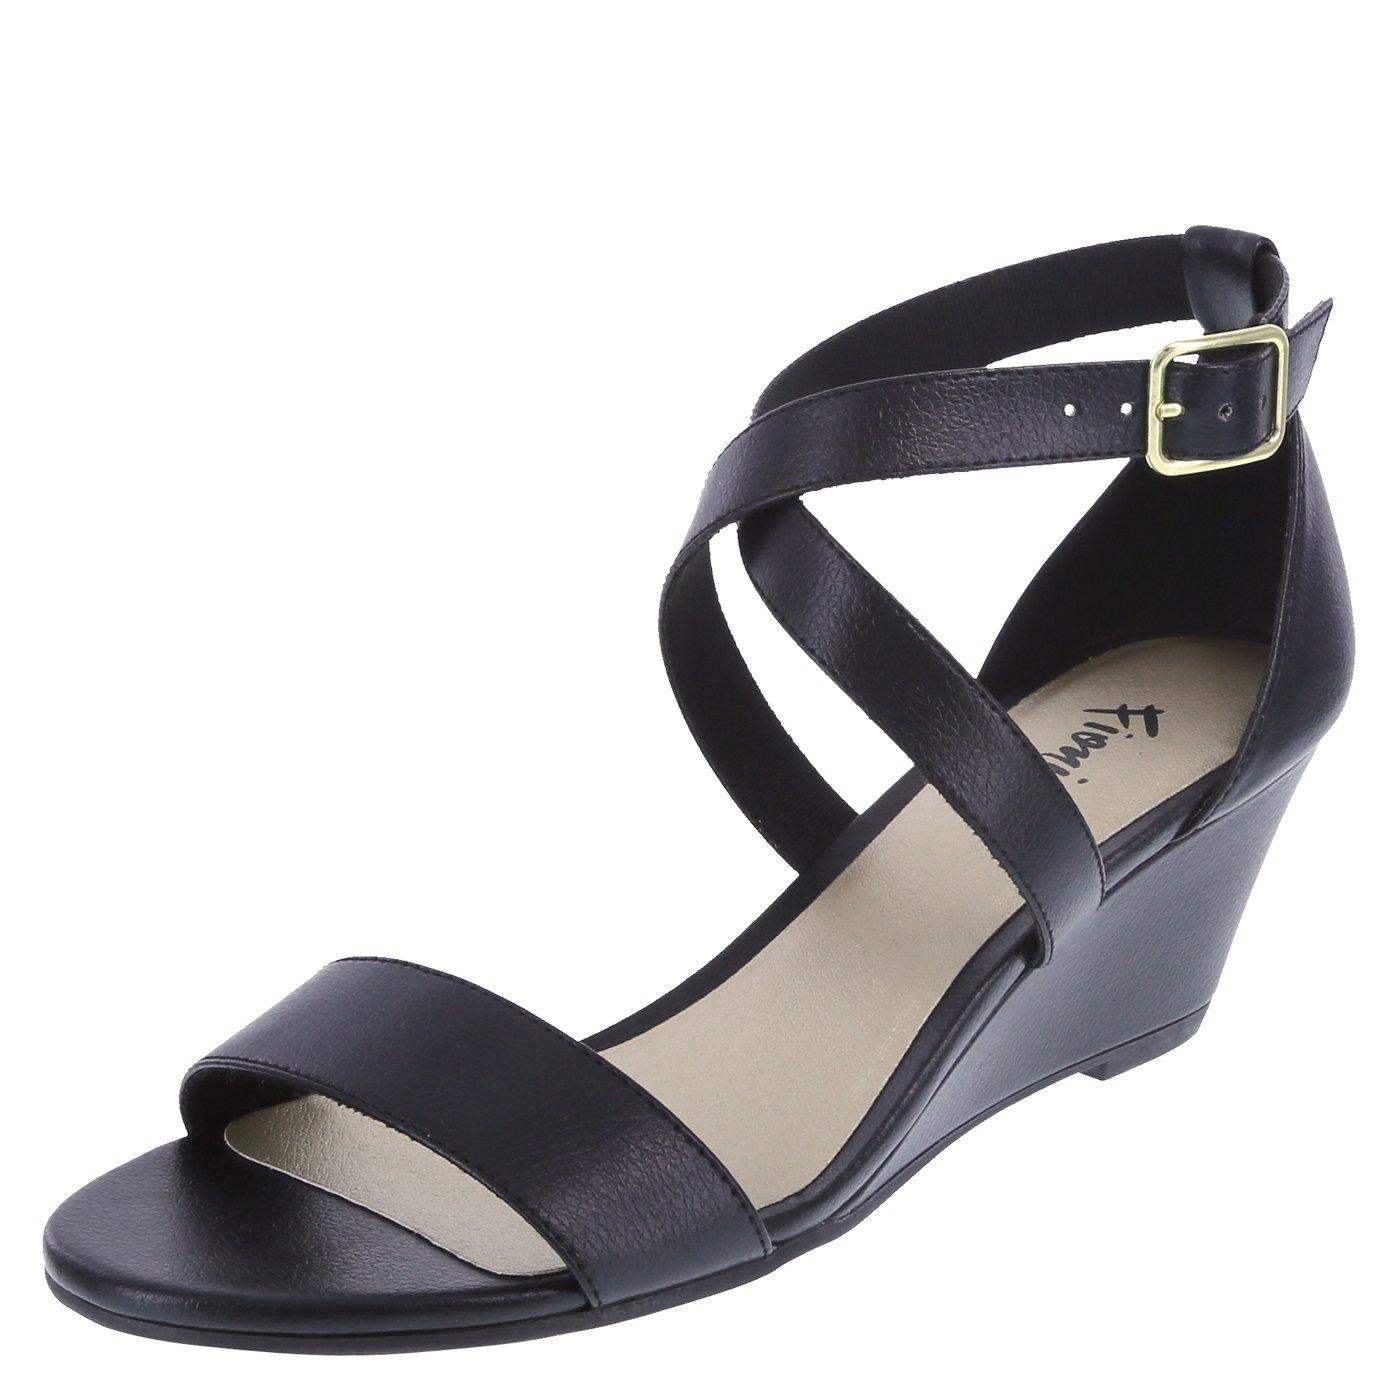 Fioni Women's Black Women's Princess Mid-Wedge Sandal 8.5 Regular